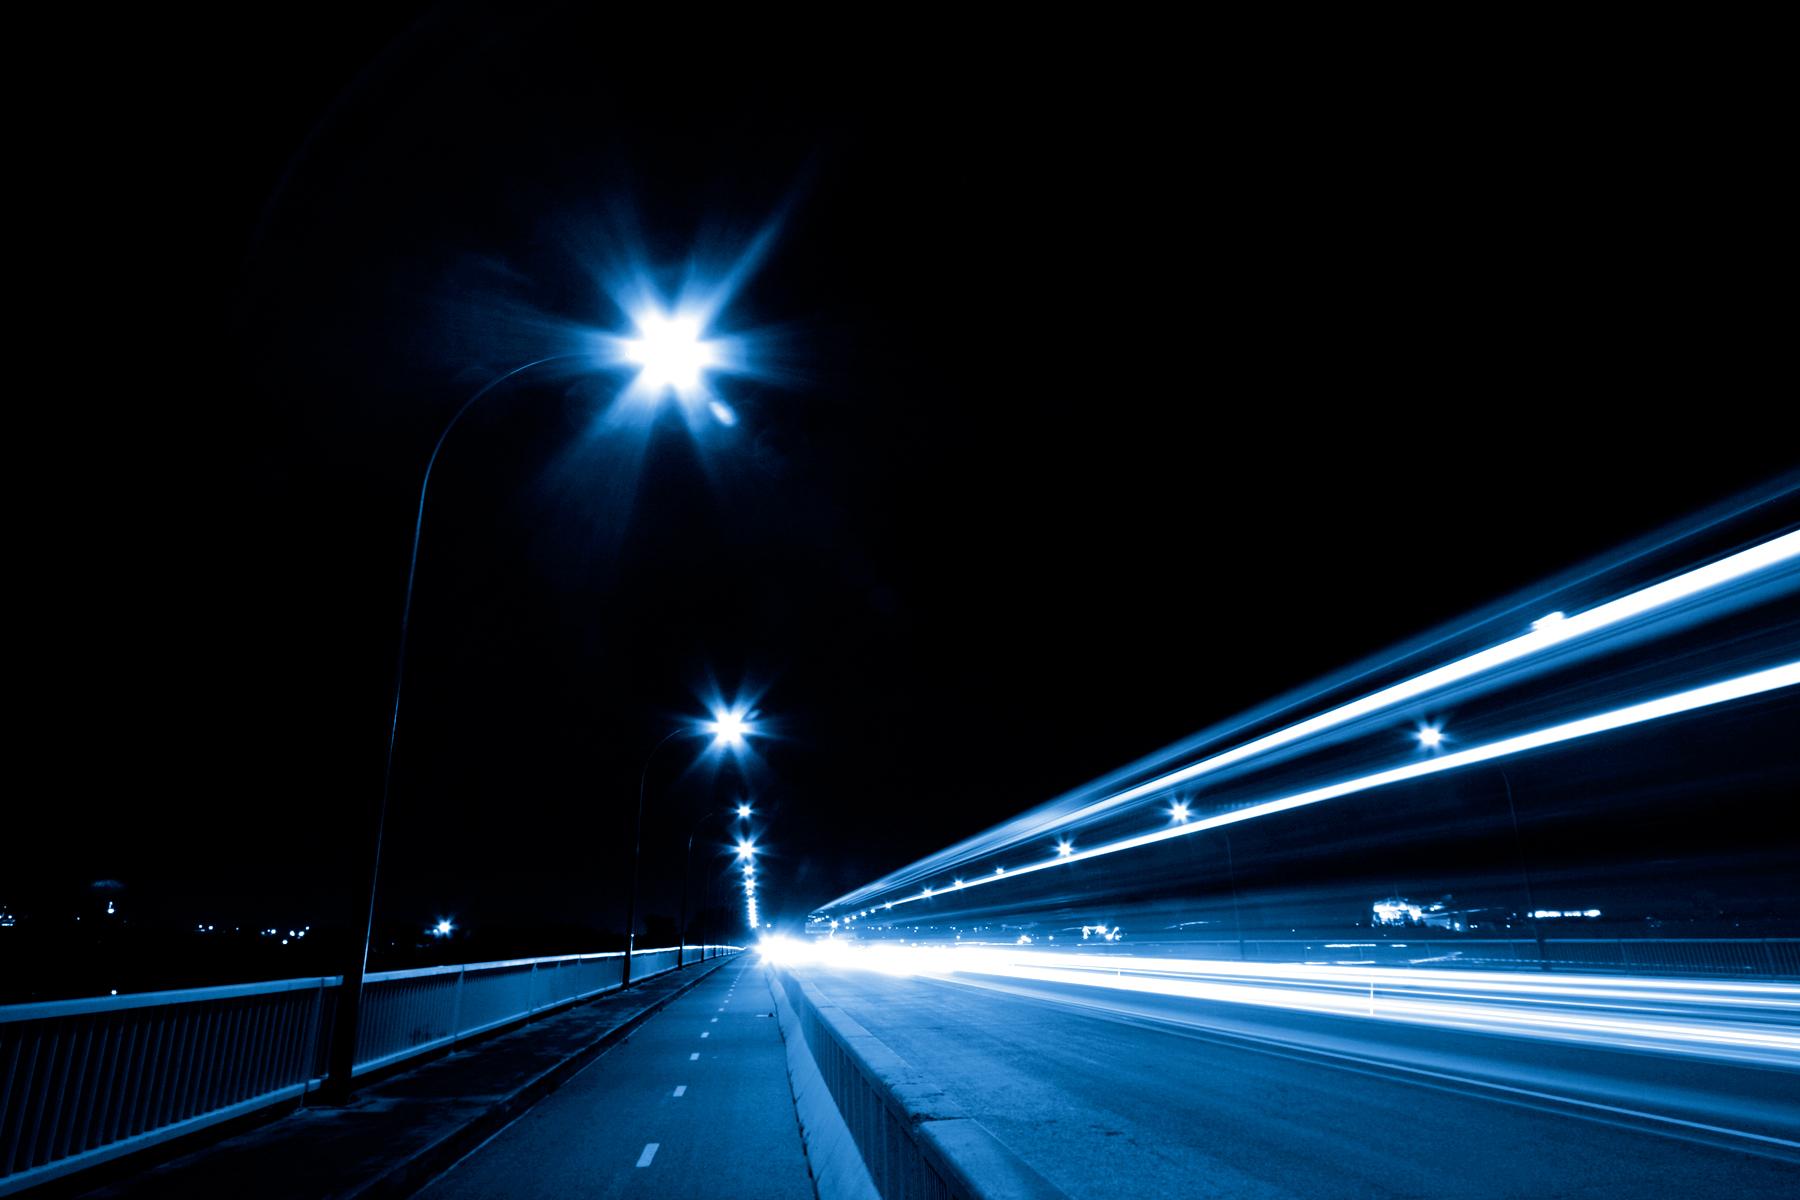 Night Traffic Scene, Abstract, Scene, Monotone, Photo, HQ Photo